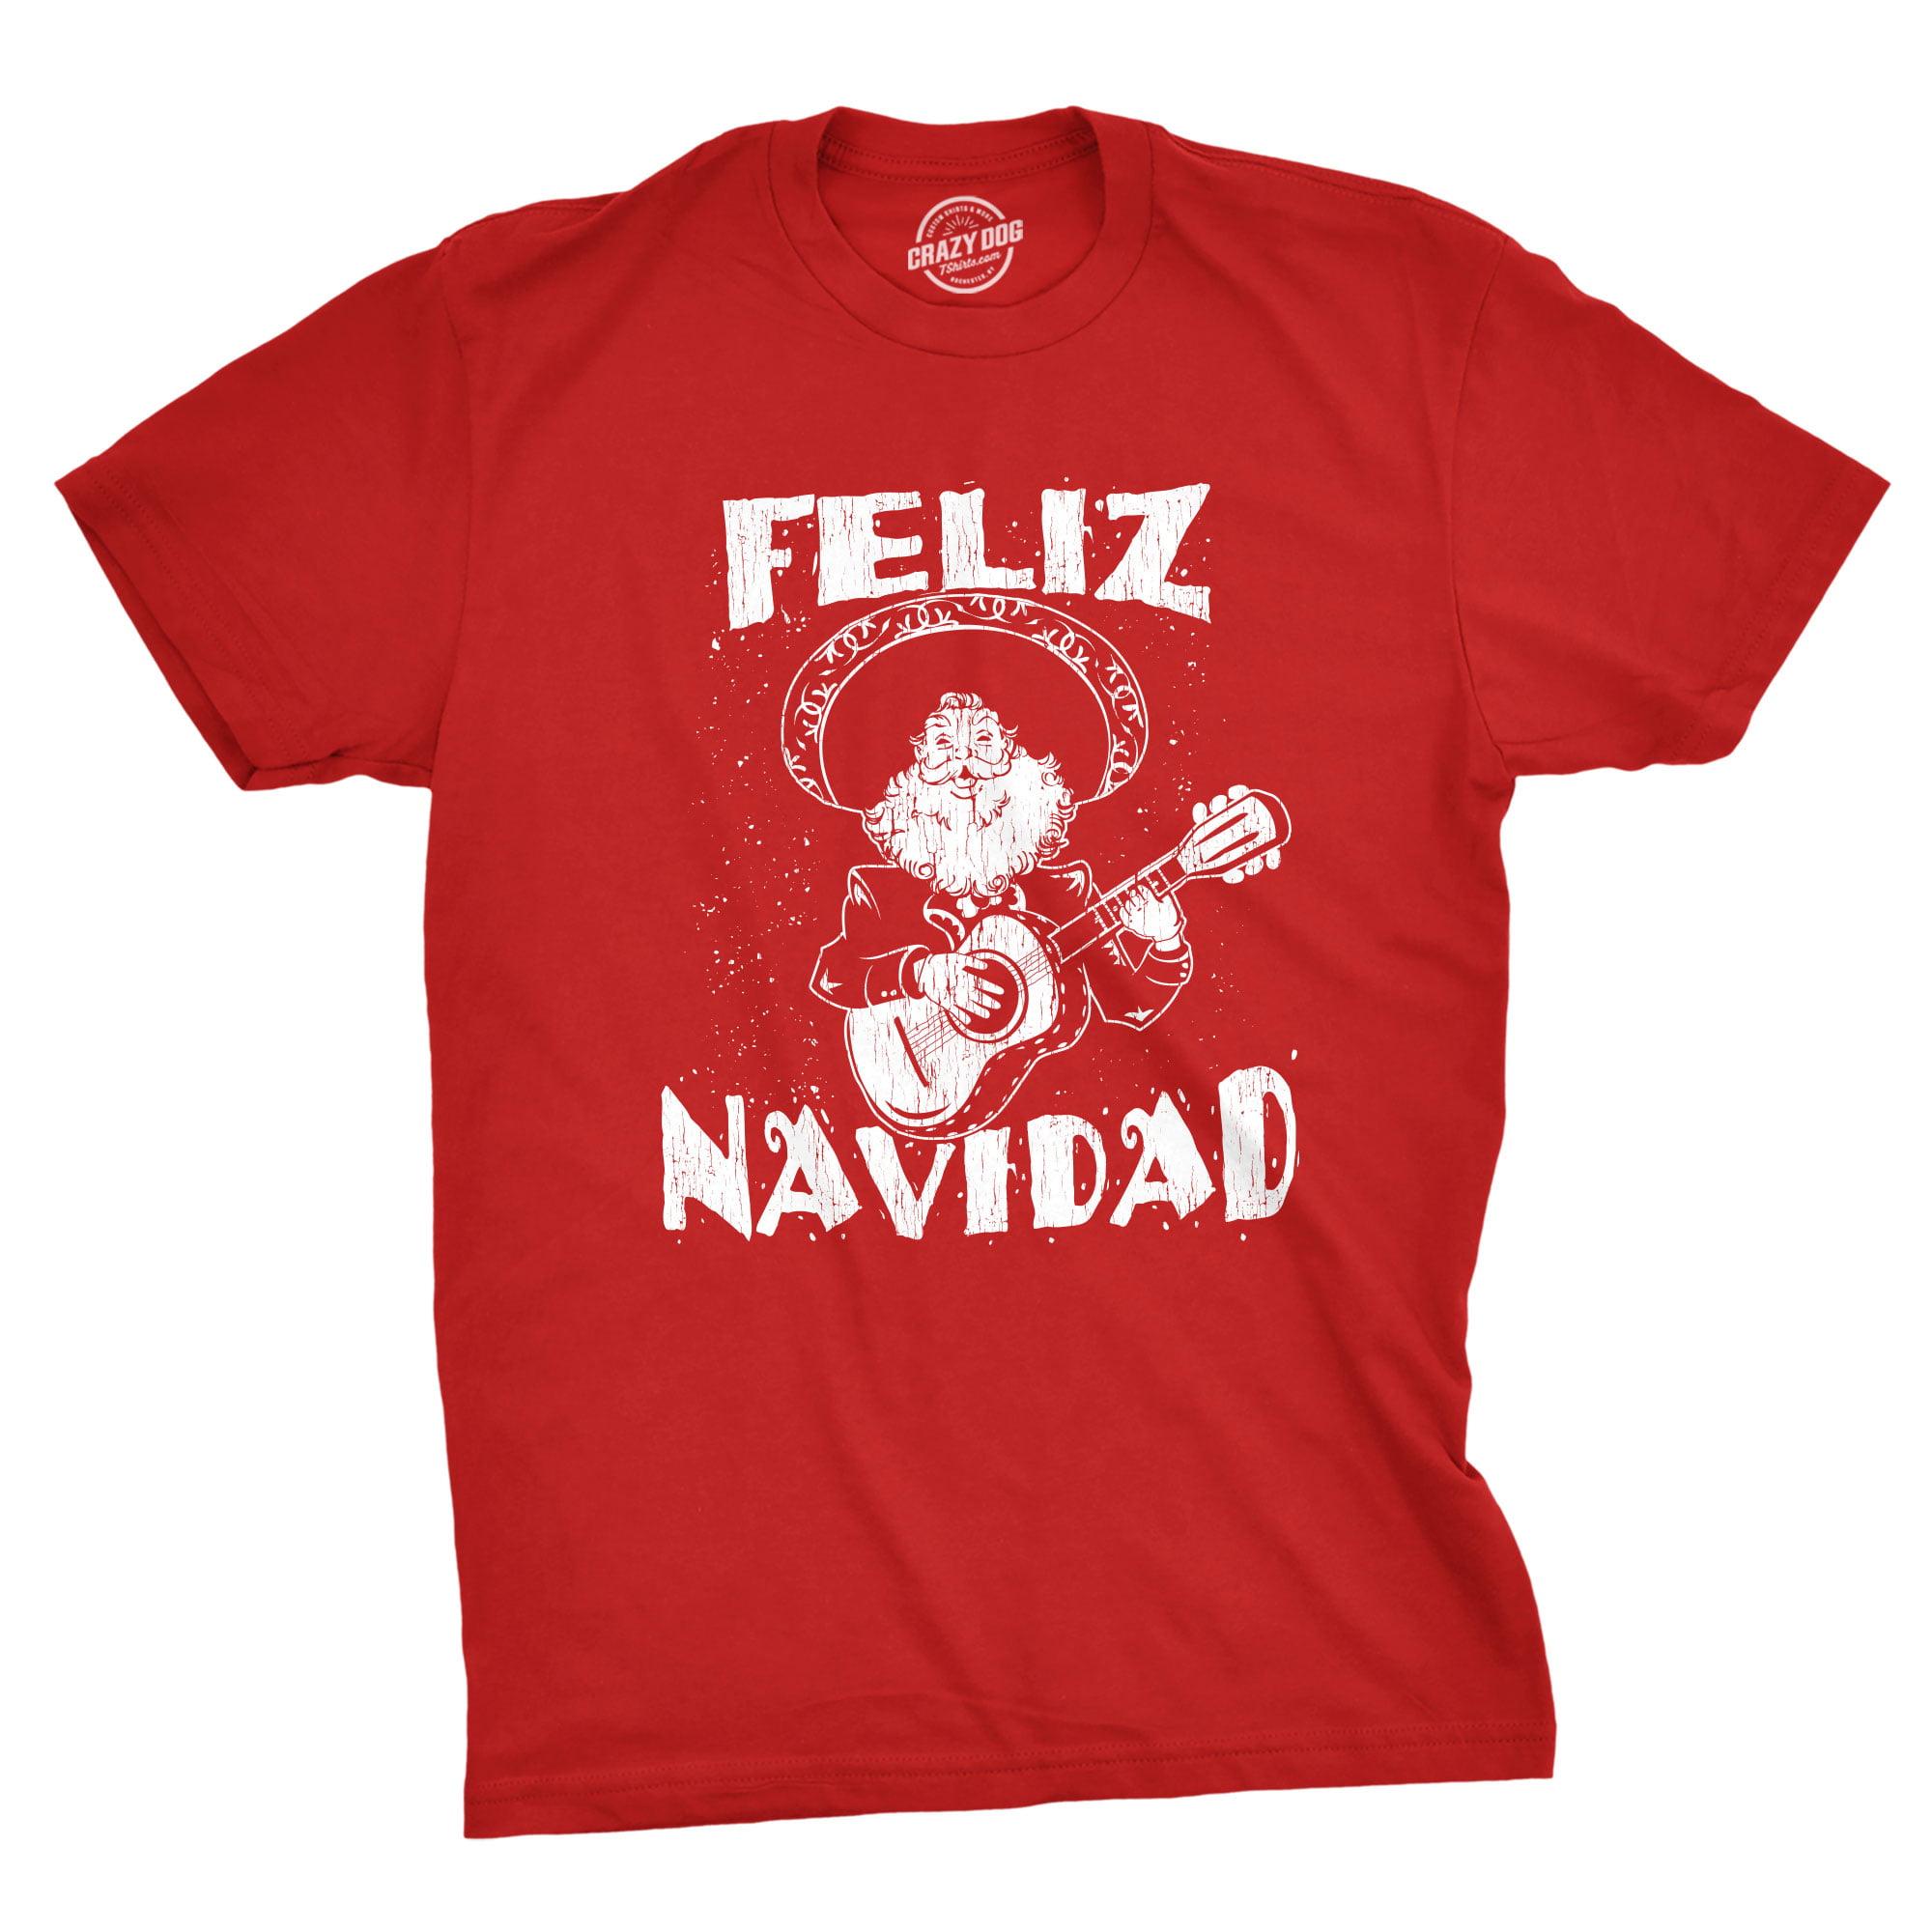 Guitars Art Fashion Mens T-Shirt and Hats Youth /& Adult T-Shirts